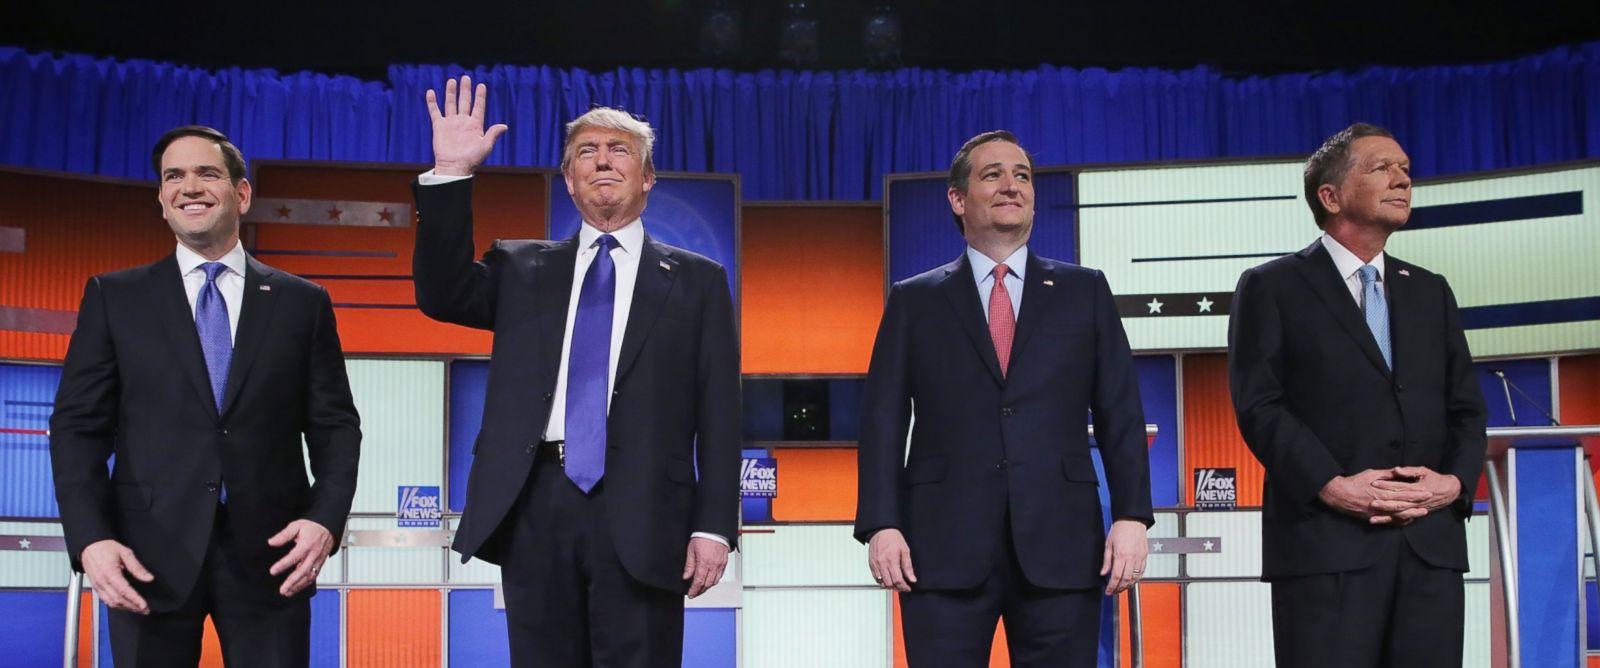 PHOTO: Republican presidential candidates Sen. Marco Rubio, Donald Trump, Sen. Ted Cruz, and Ohio Gov. John Kasich, participate in a debate sponsored by Fox News on March 3, 2016 in Detroit.